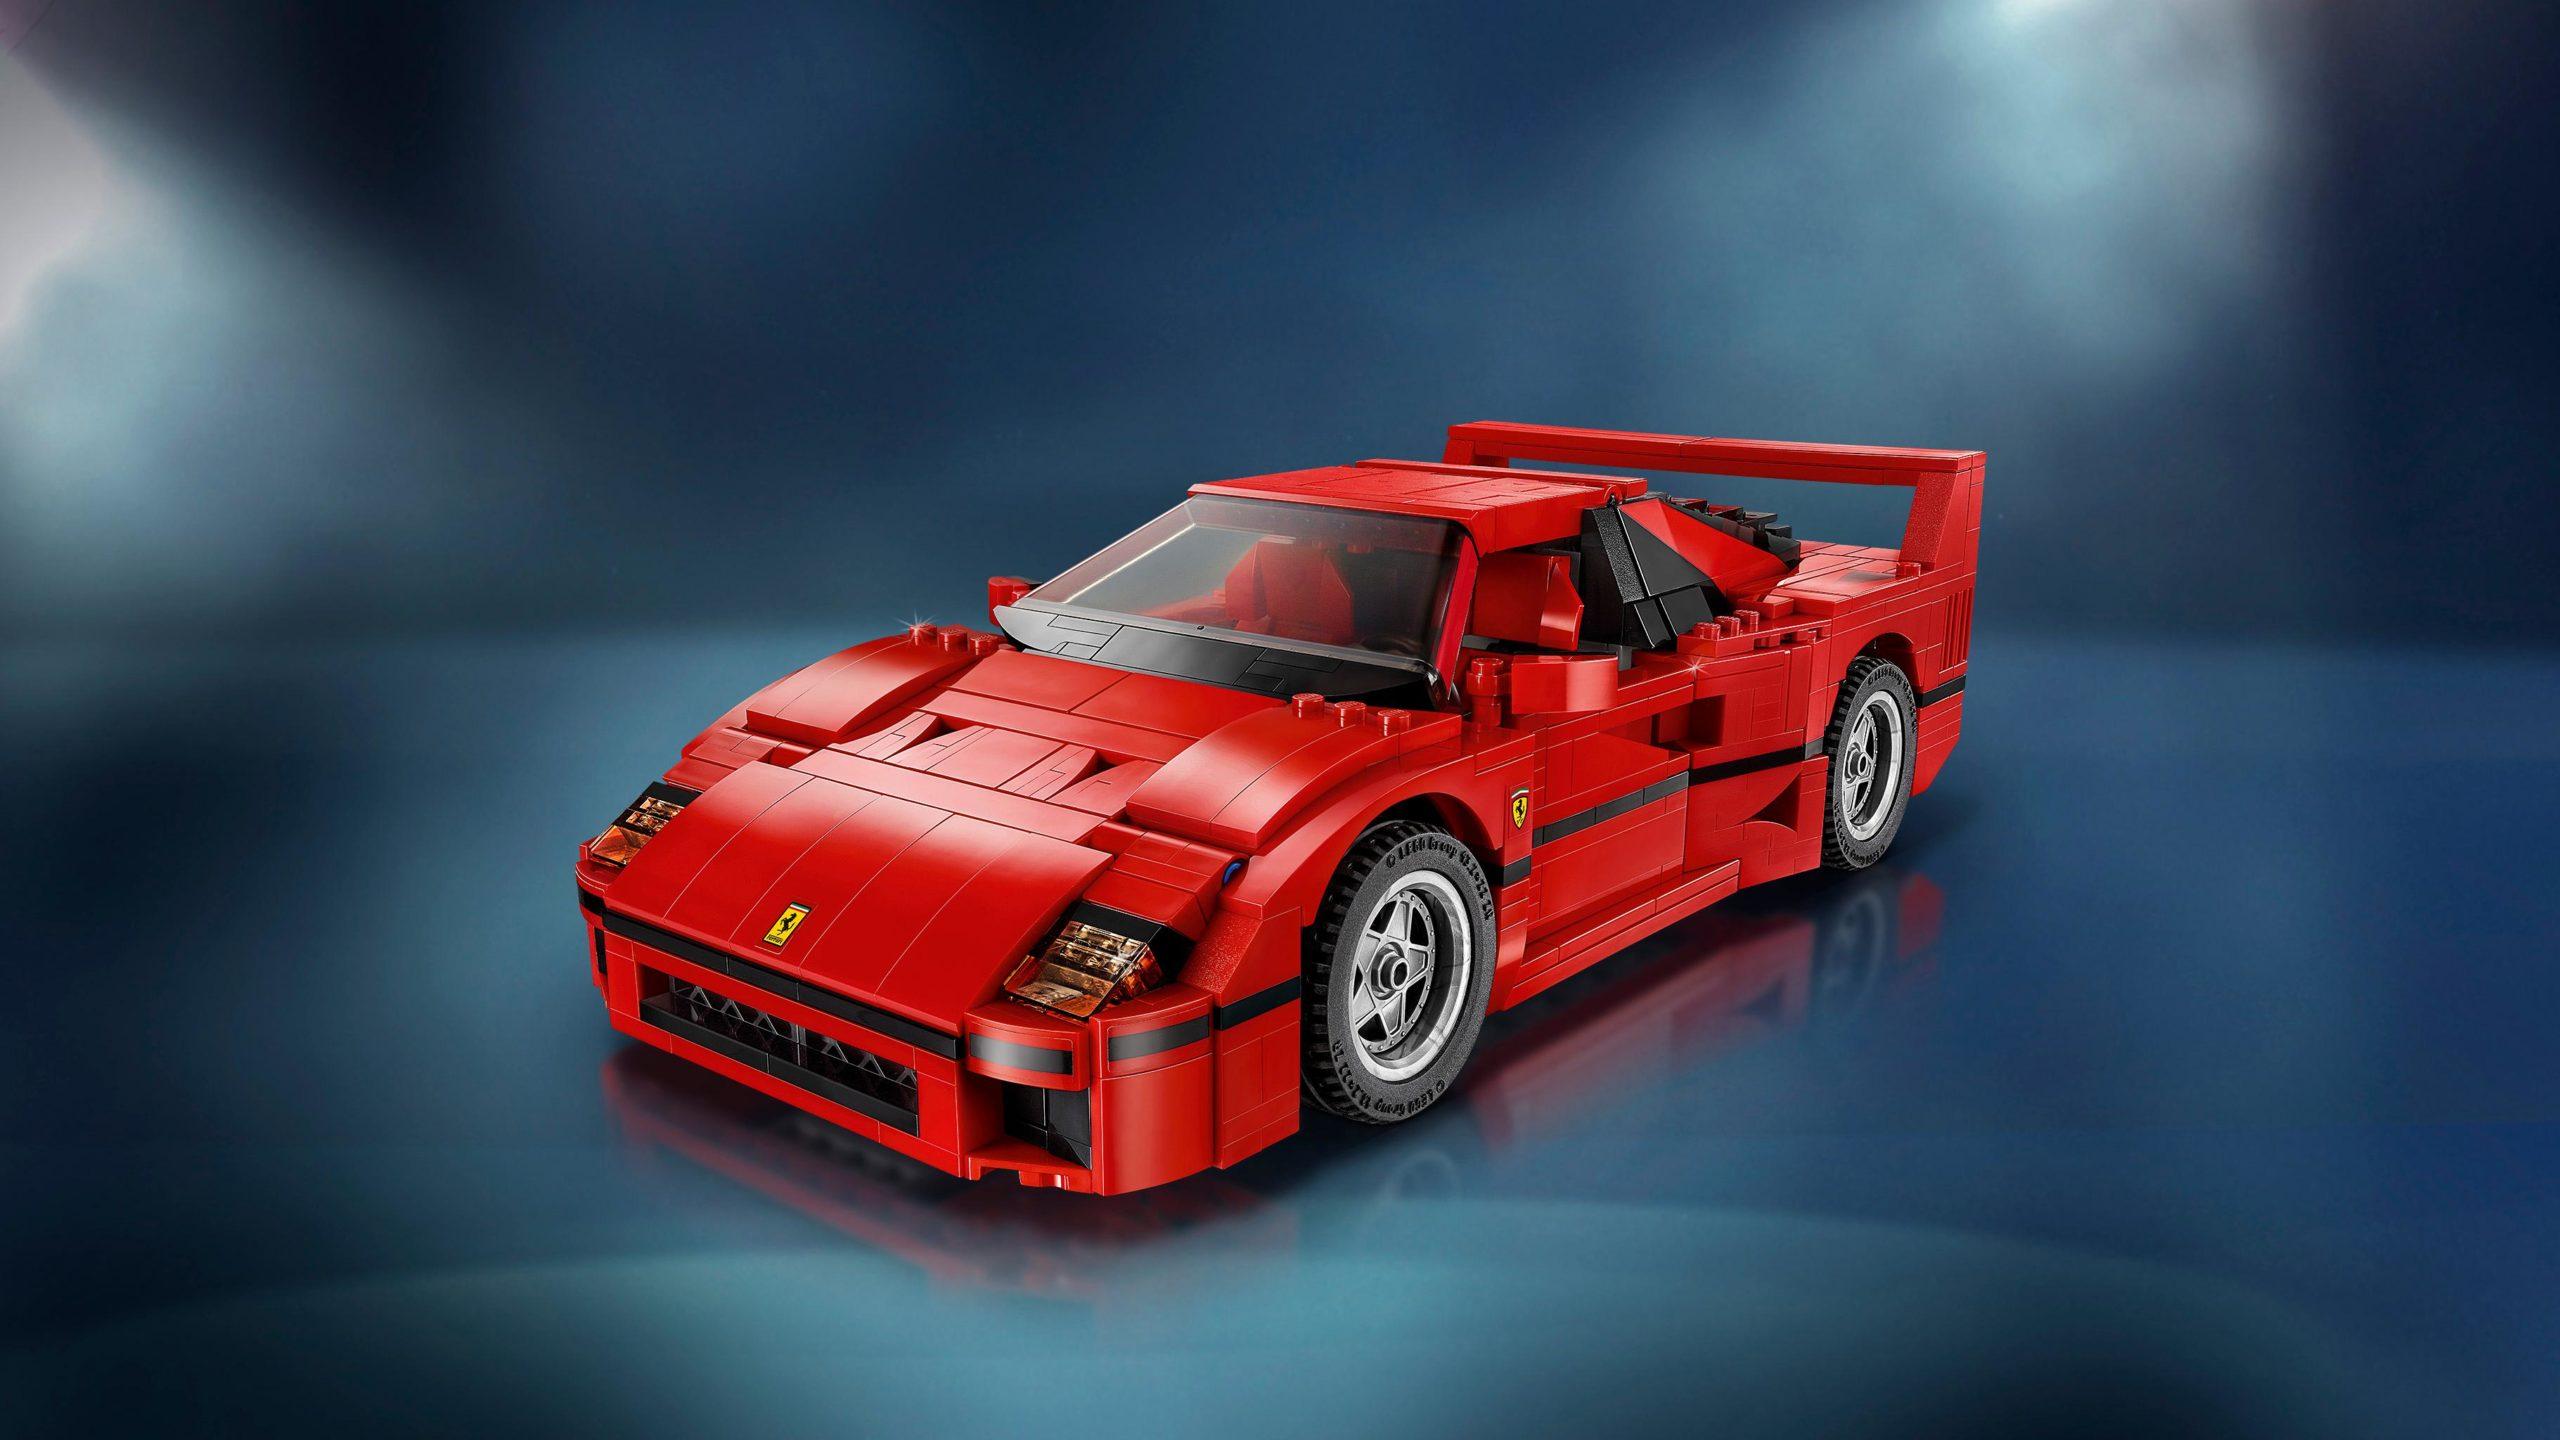 Lego Creator Expert Ferrari F40 Construction Set